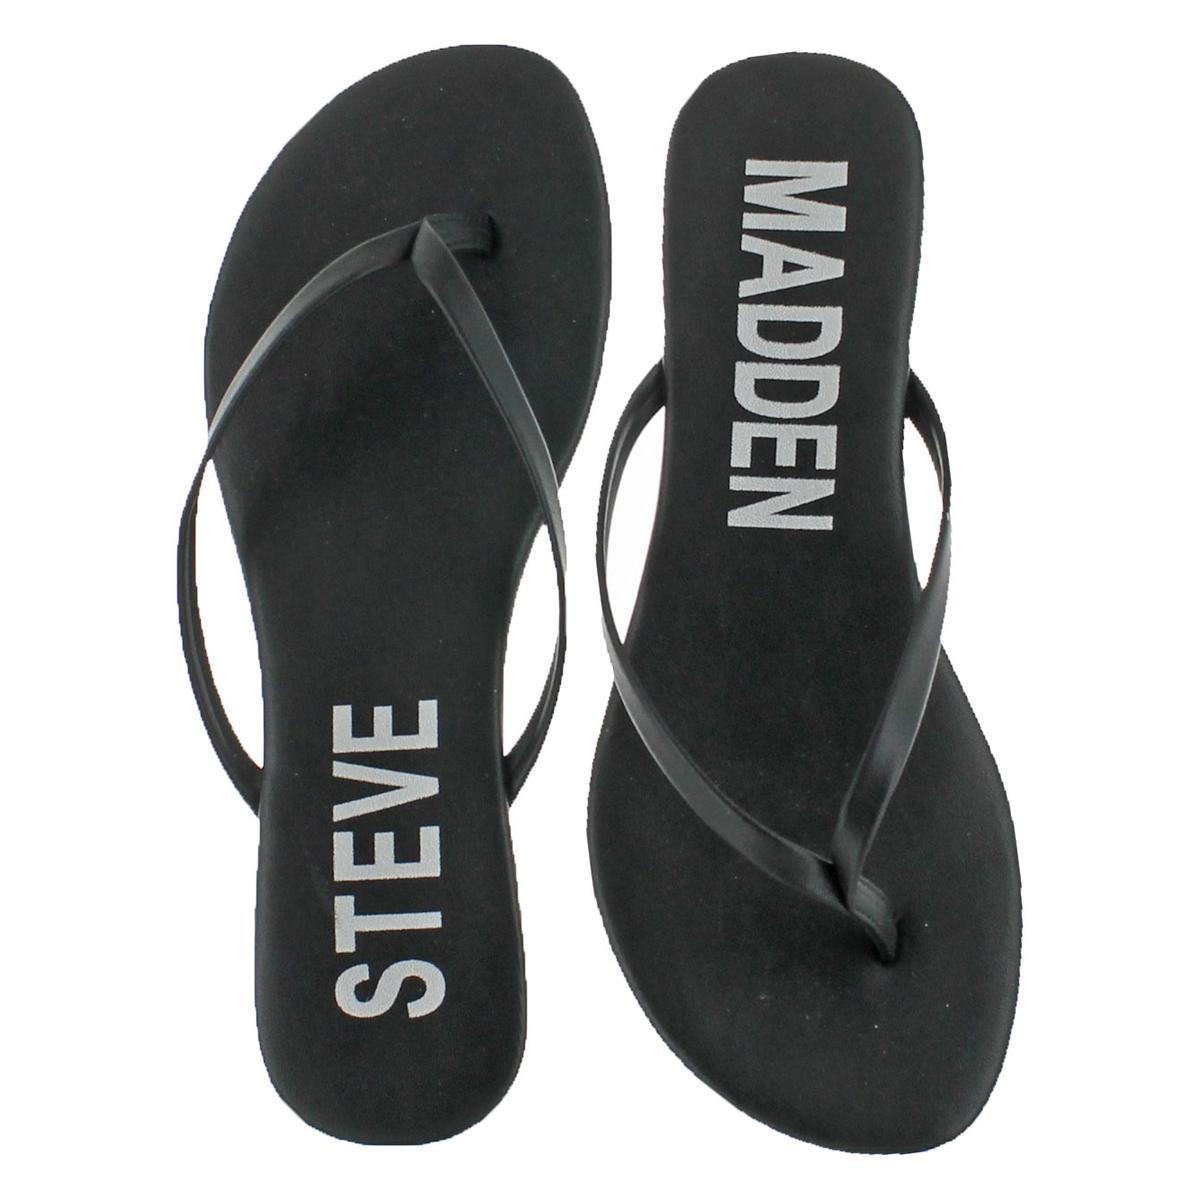 Steve-Madden-Women-039-s-Blink-Slip-On-Casual-Thong-Flat-Sandals-Shoes thumbnail 4